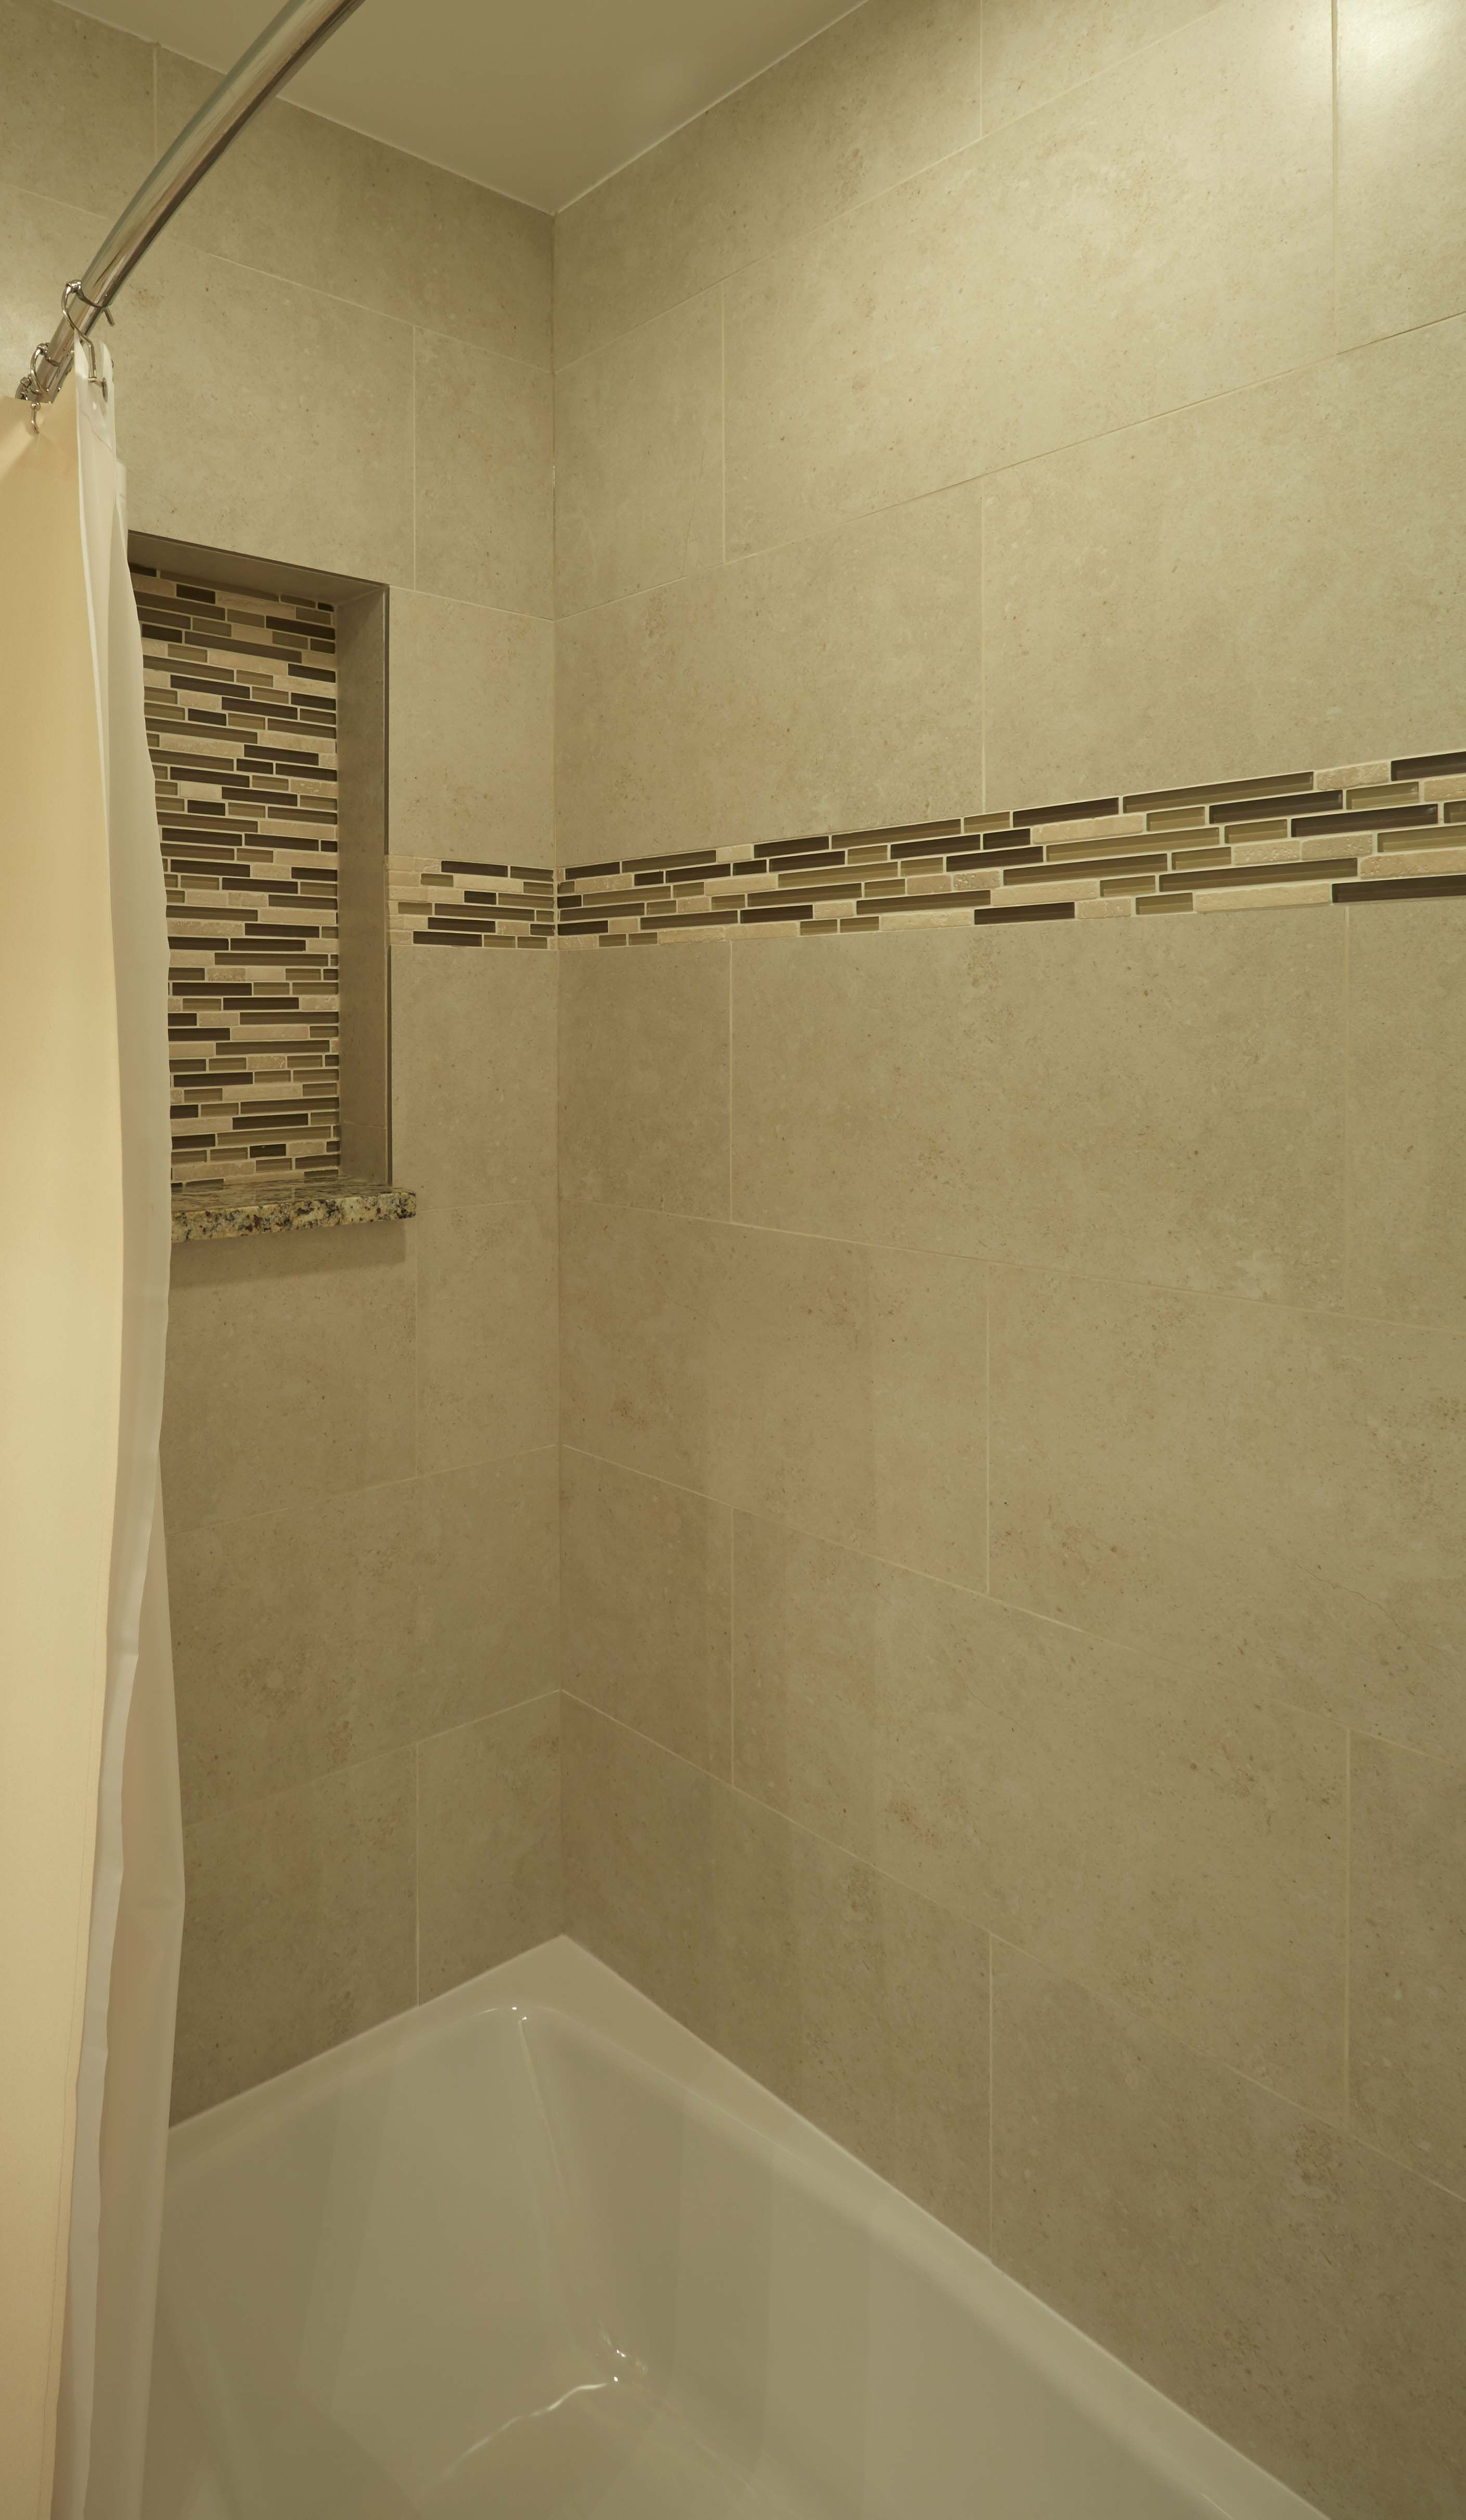 kohler villager bathtub eleganza wall tile and accent strip gatco curved shower rod